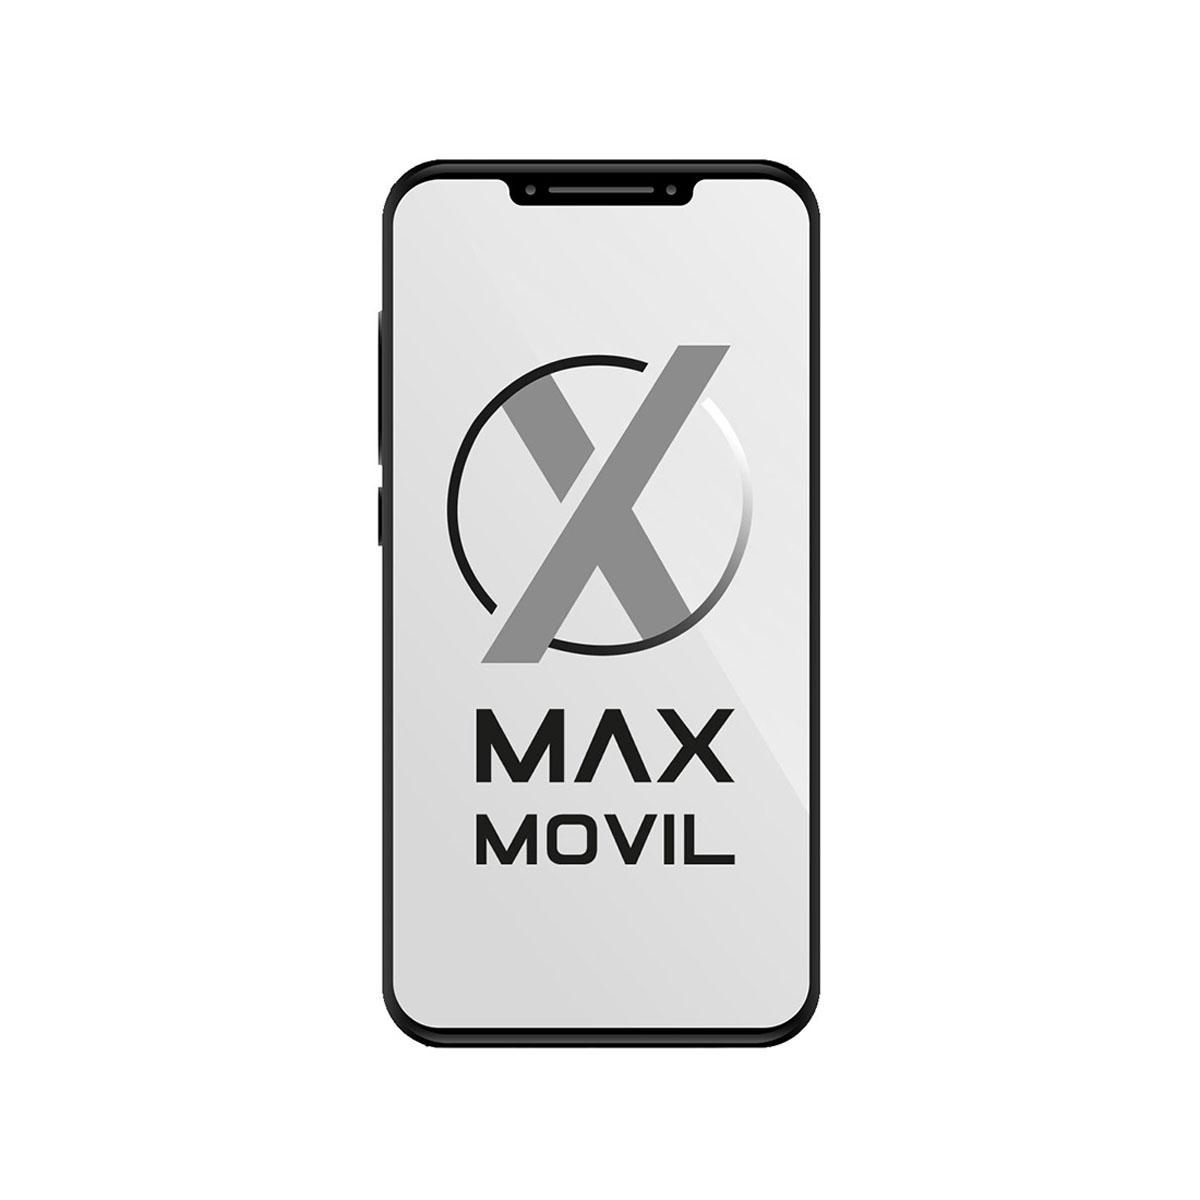 Huawei Mate 20 Pro 6GB/128GB Twilight Dual SIM LYA-LX9 + FUNDA GRATIS